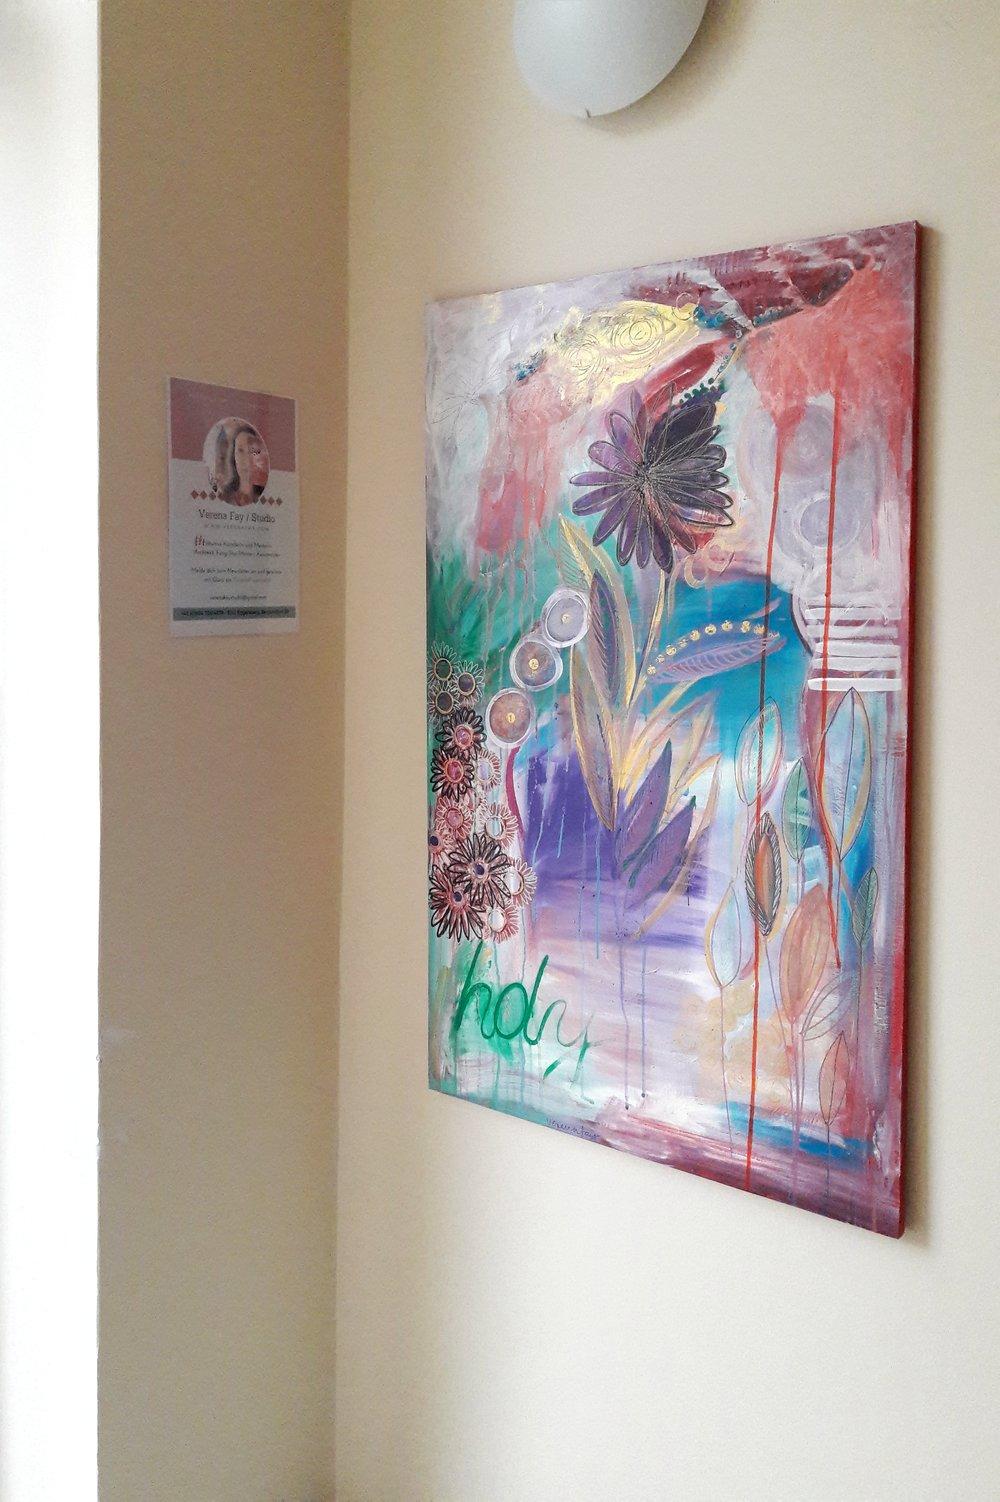 VERENA FAY Studio - Spring Collection at Café Zagler / Braunau